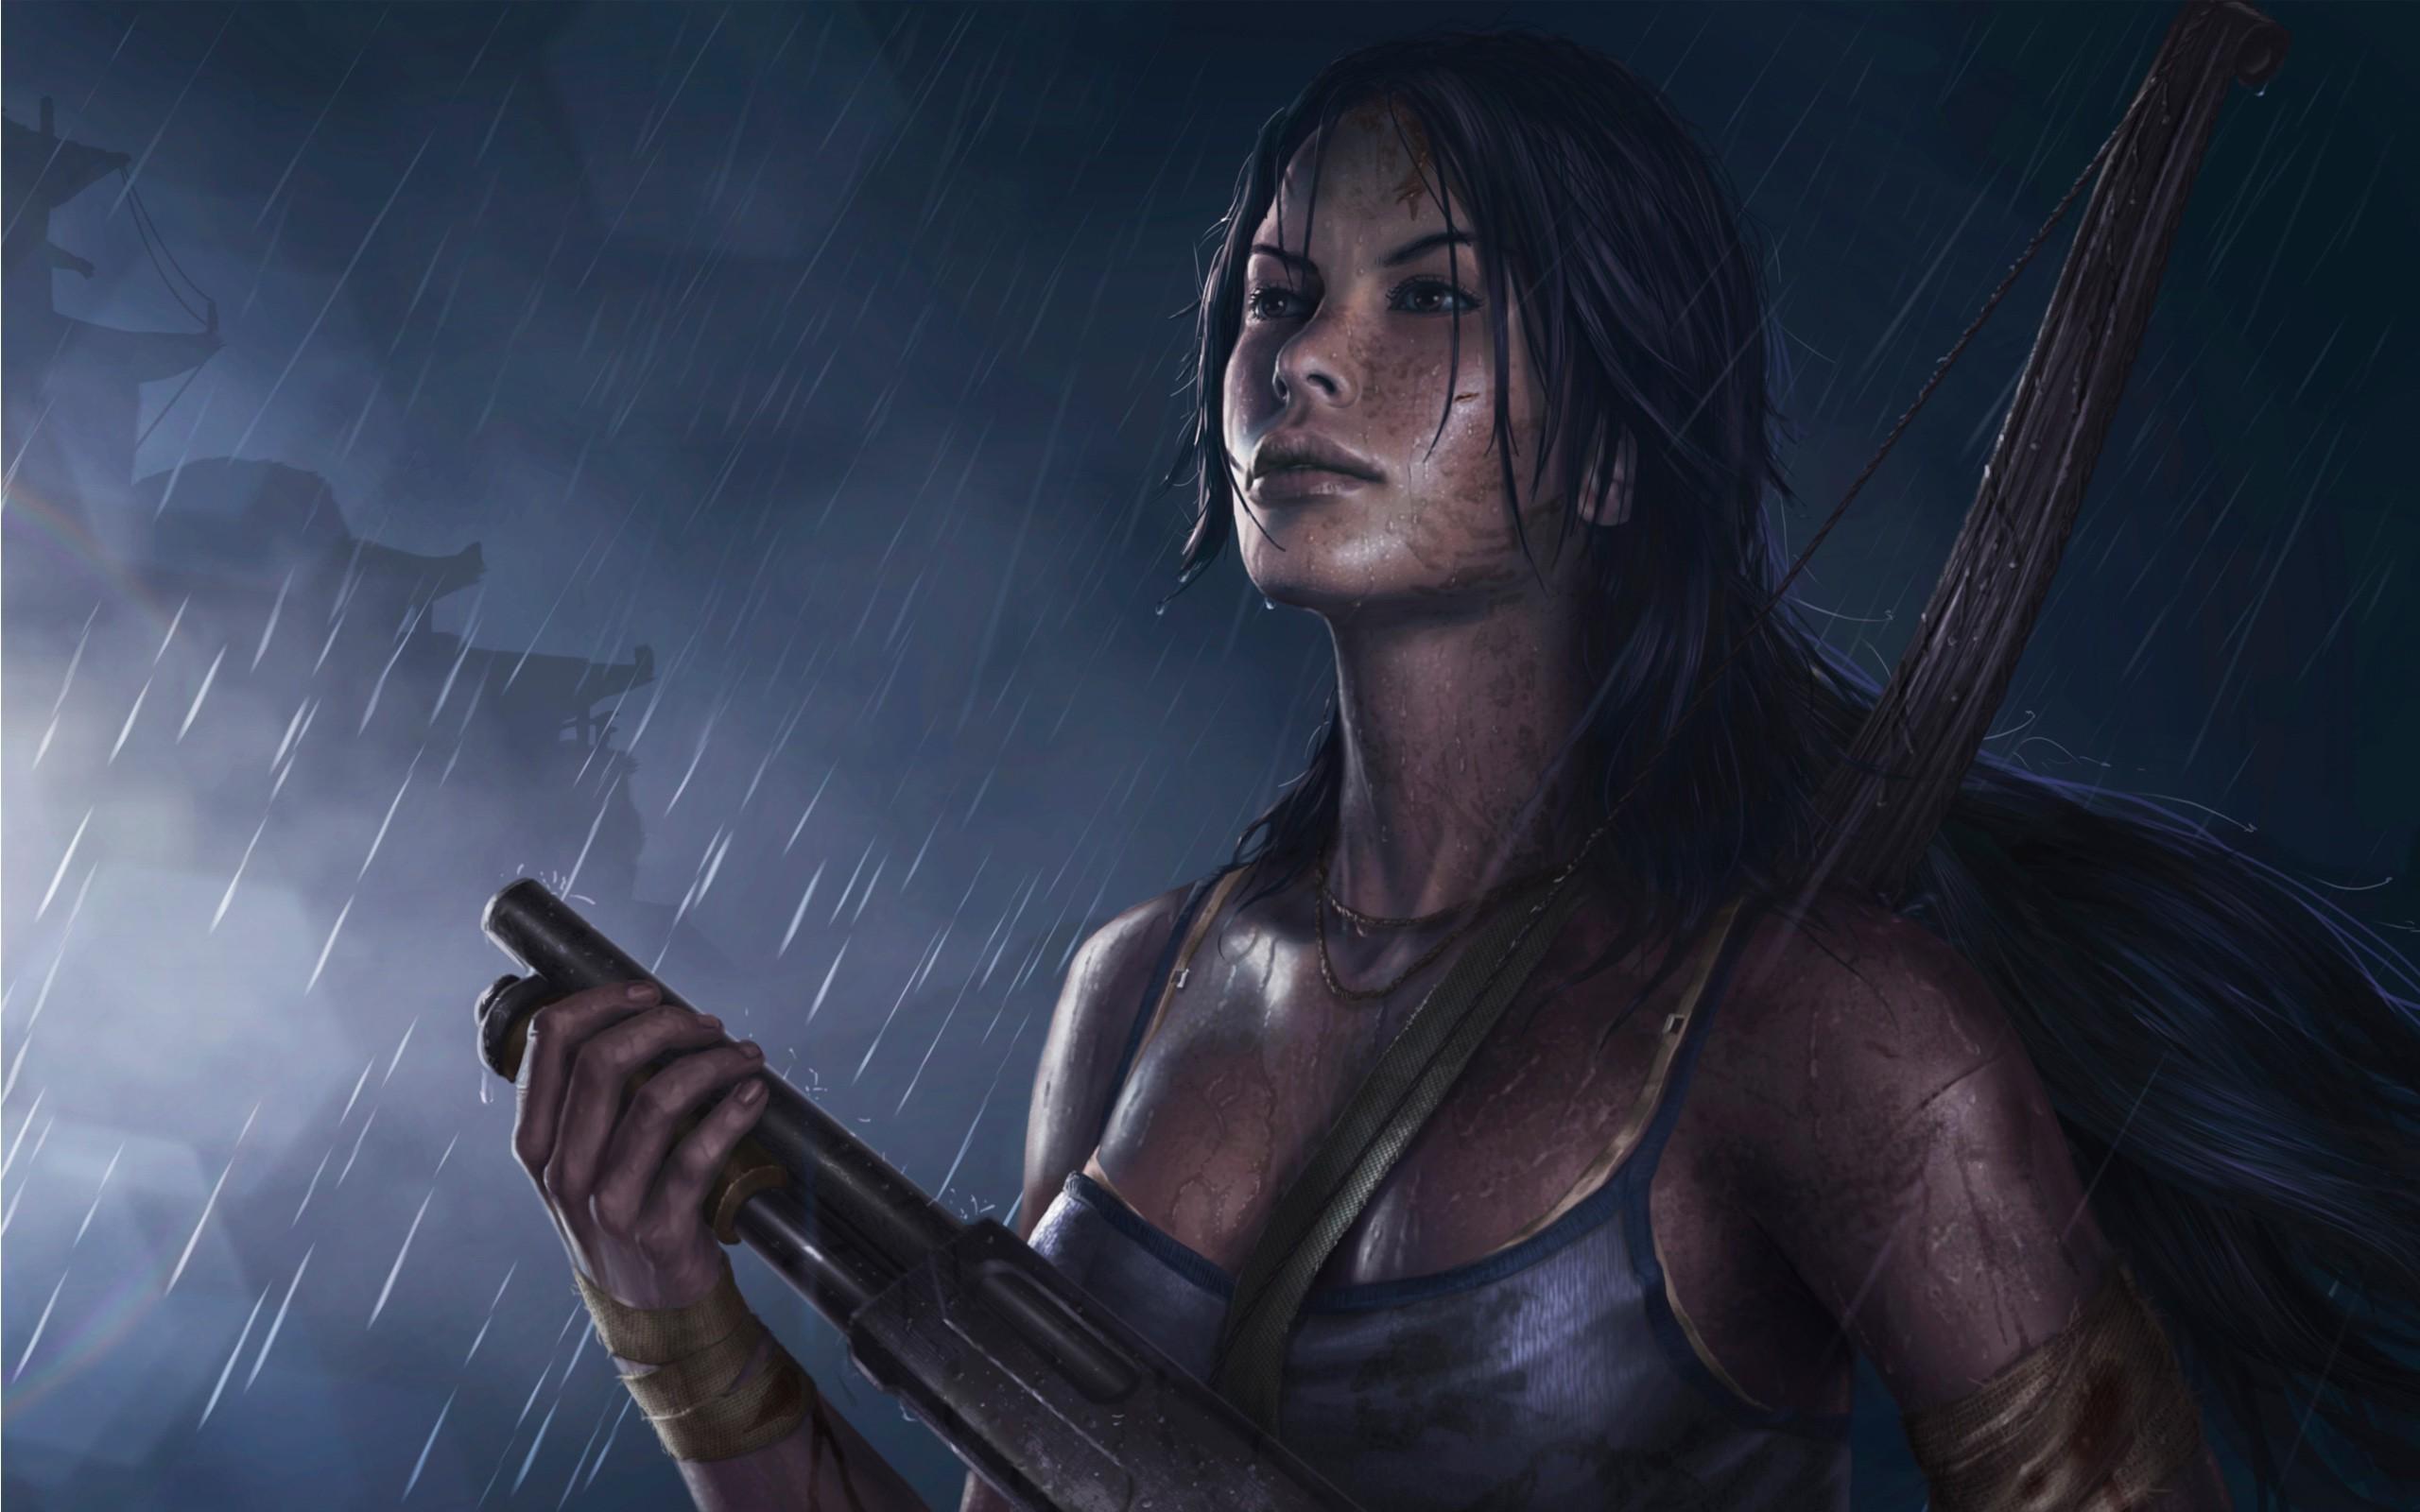 video Games, Video Game Characters, Video Game Girls, Tomb Raider, Lara  Croft